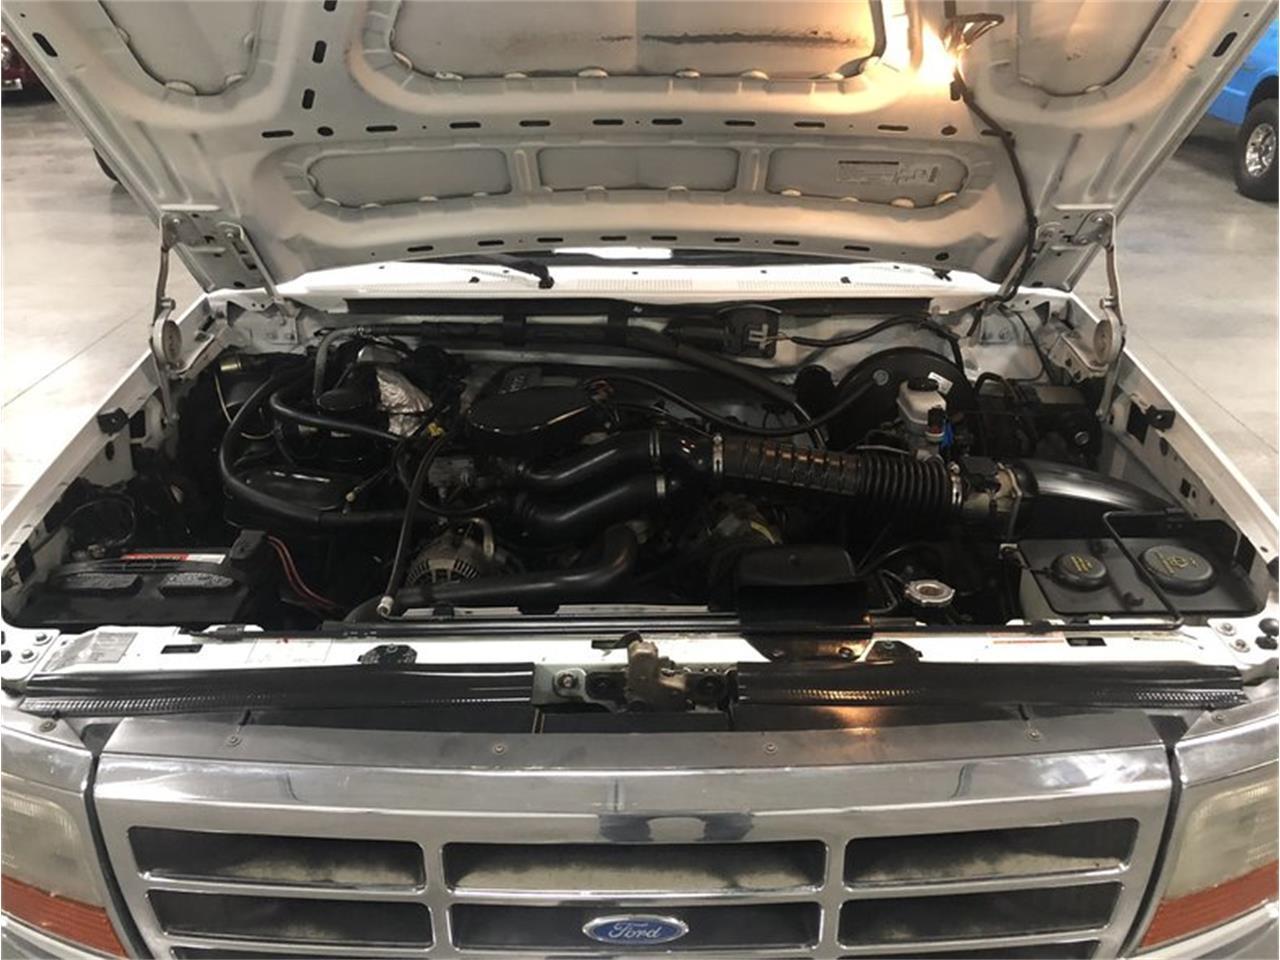 Ford Big Bronco -engine.jpg